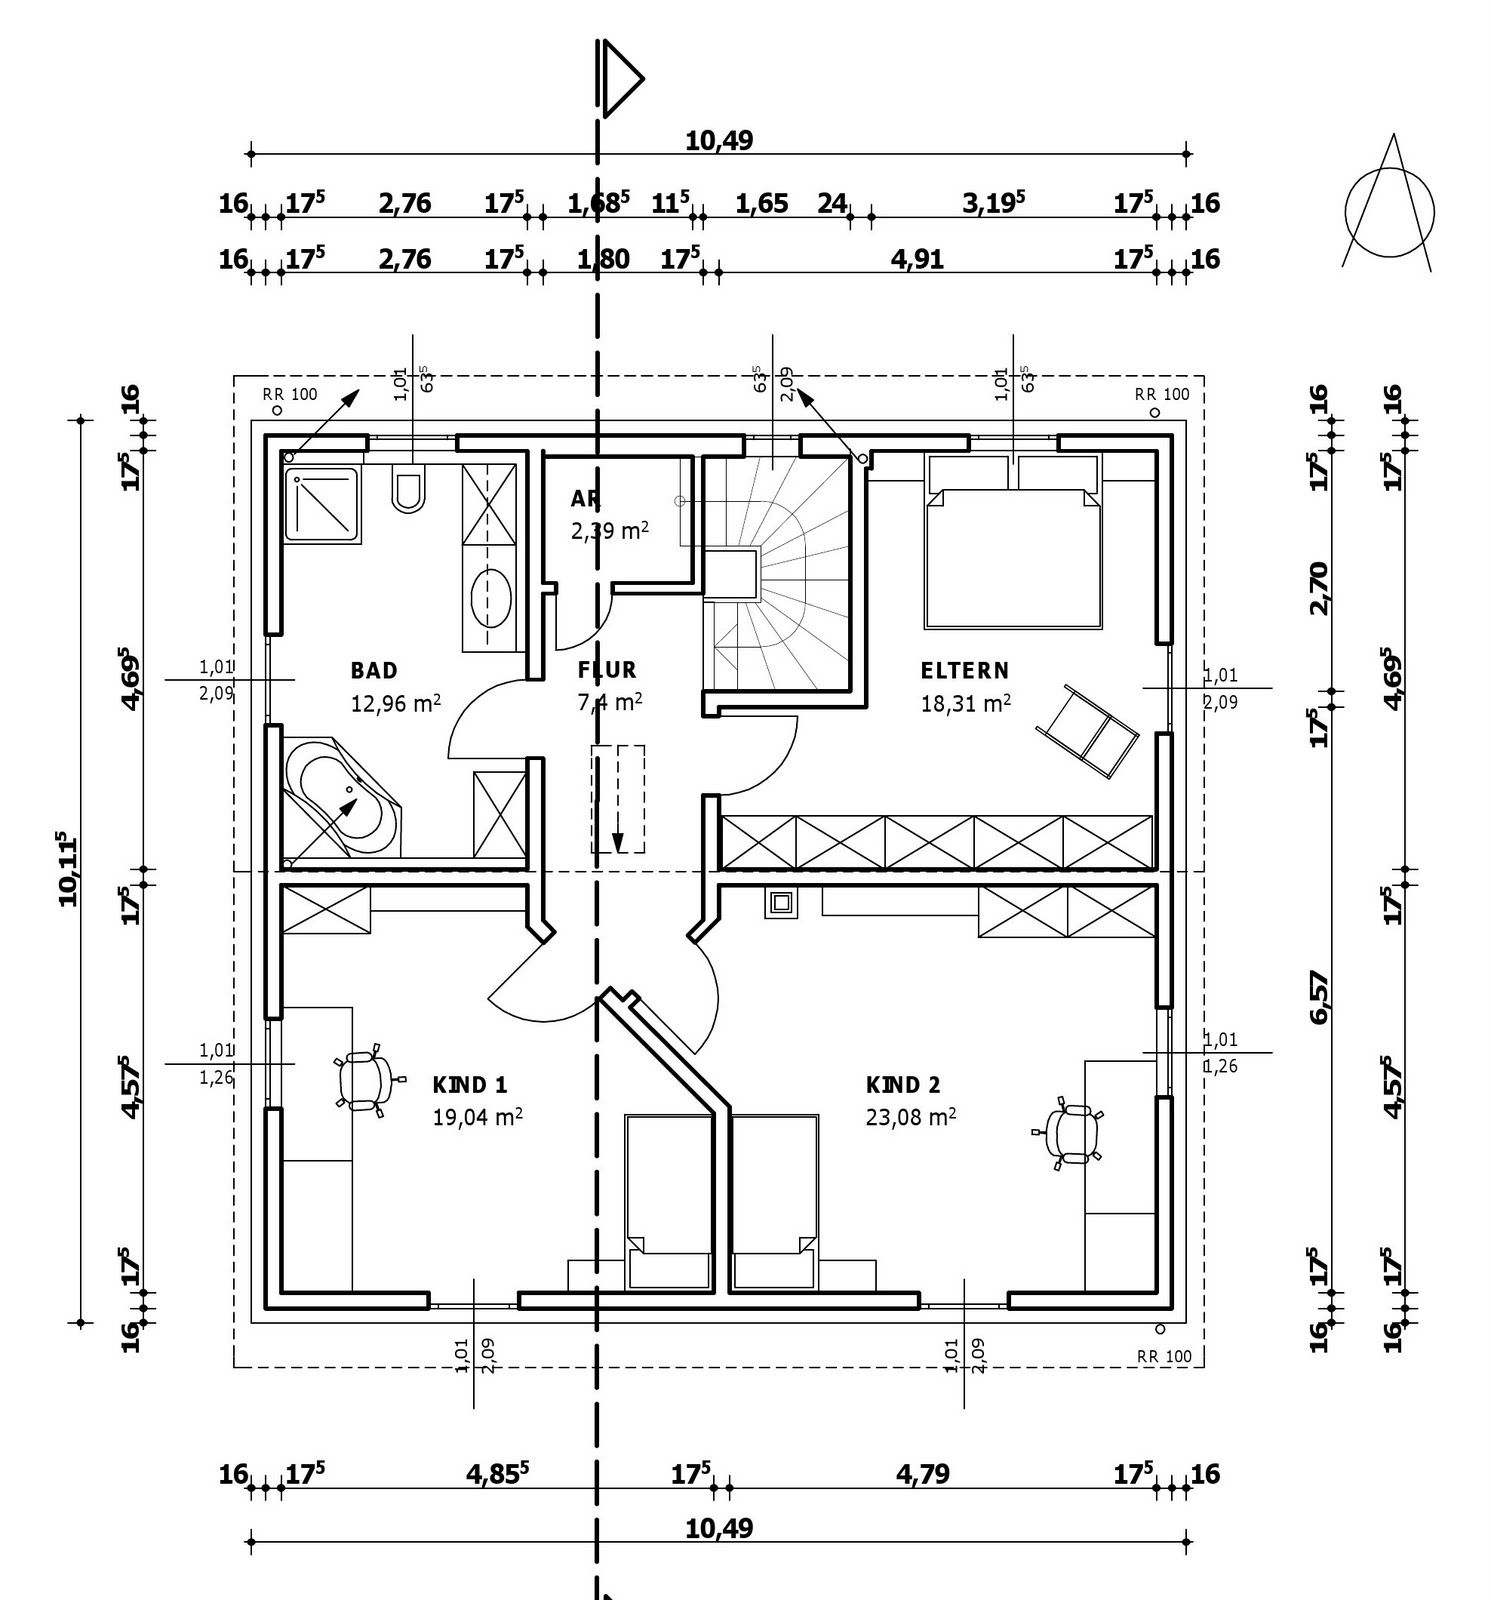 das noriplana bautagebuch august 2010. Black Bedroom Furniture Sets. Home Design Ideas